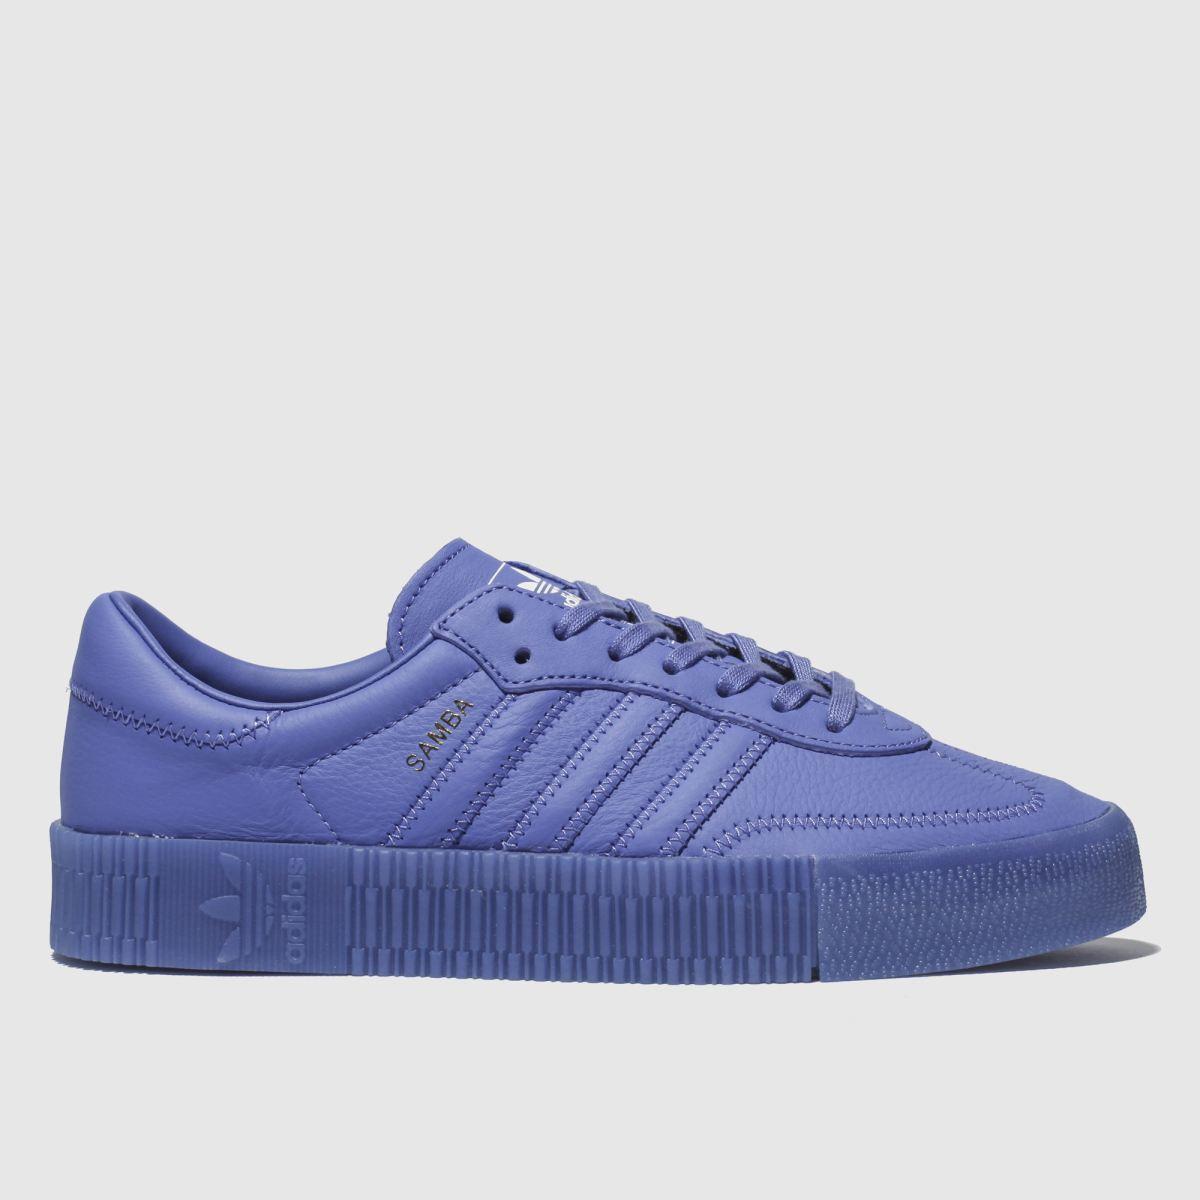 Adidas Blue Sambarose Trainers